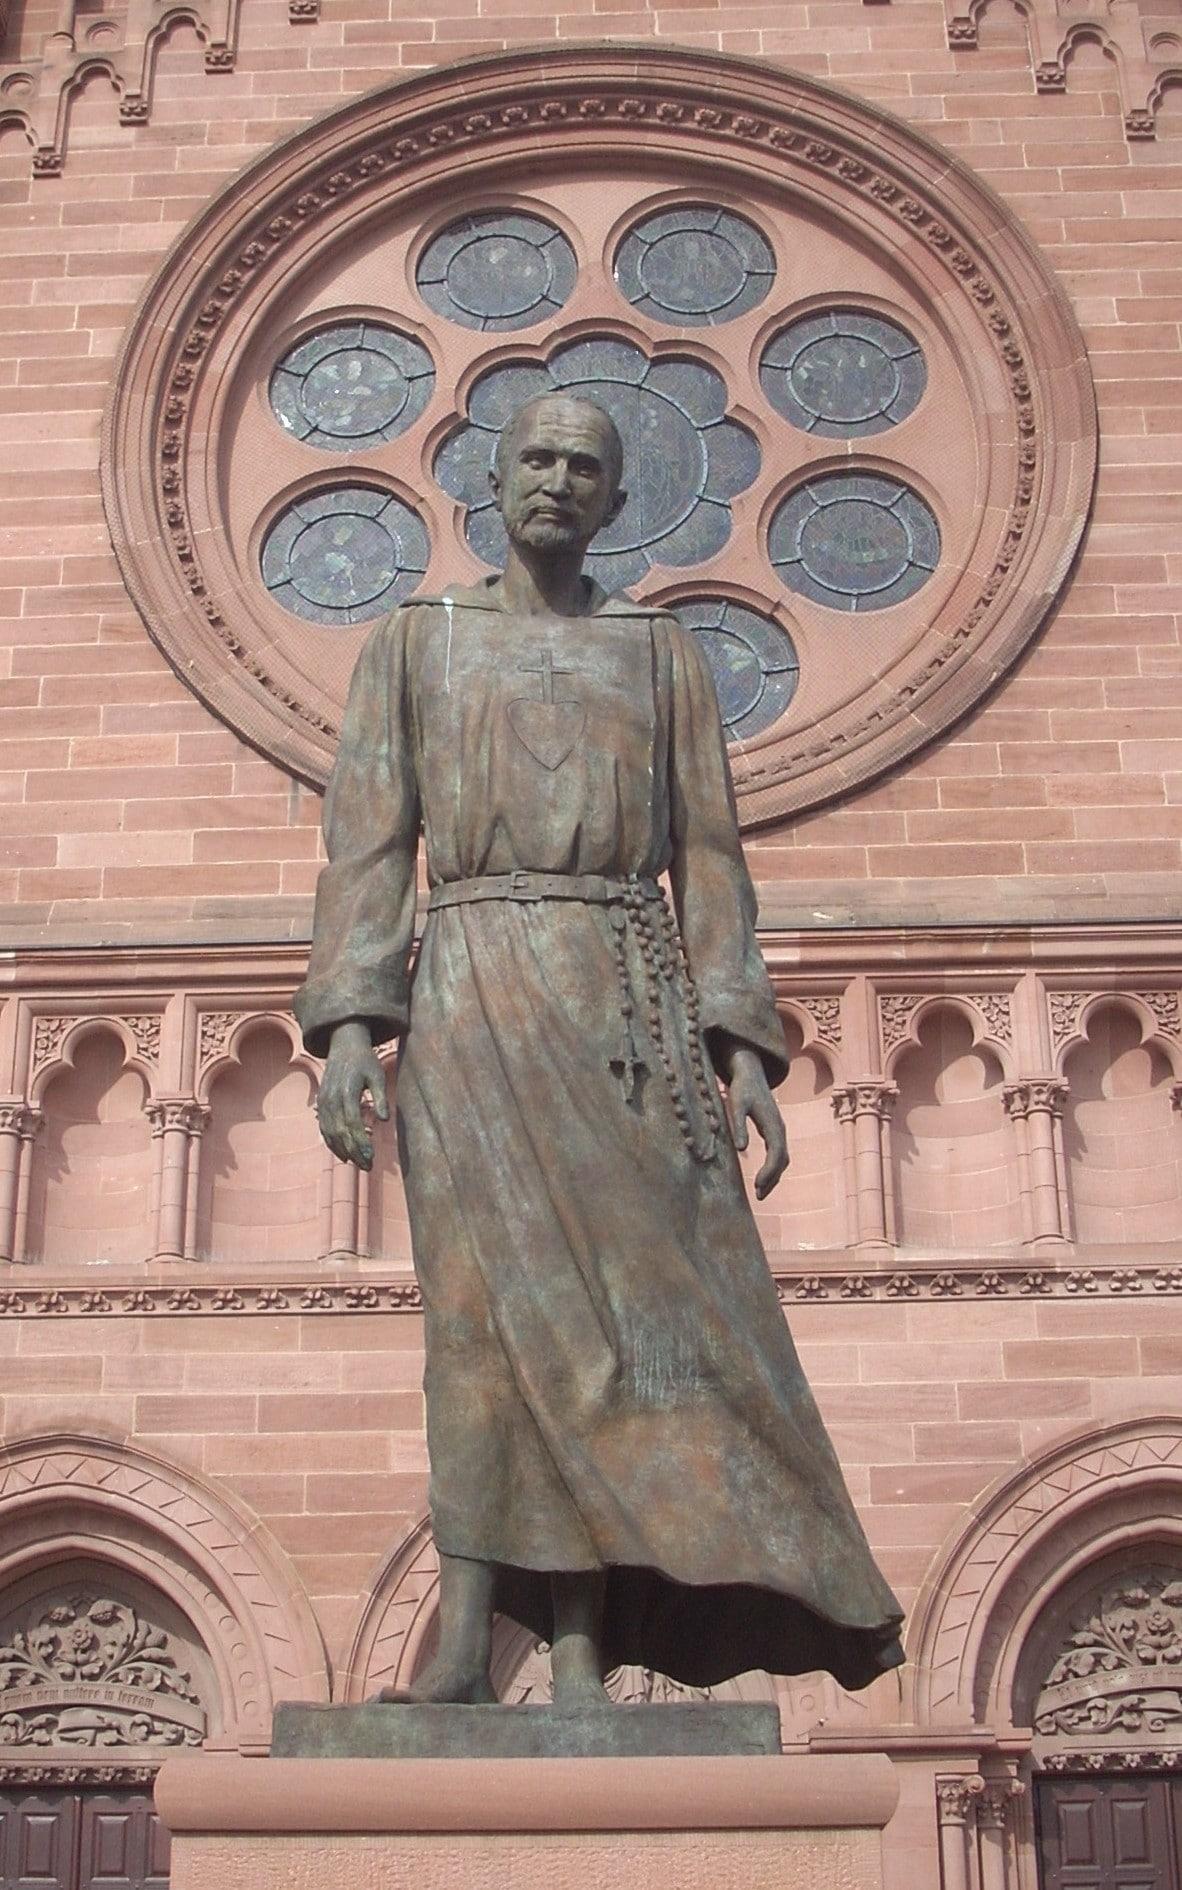 Das Denkmal von Charles de Foucauld in Straßburg